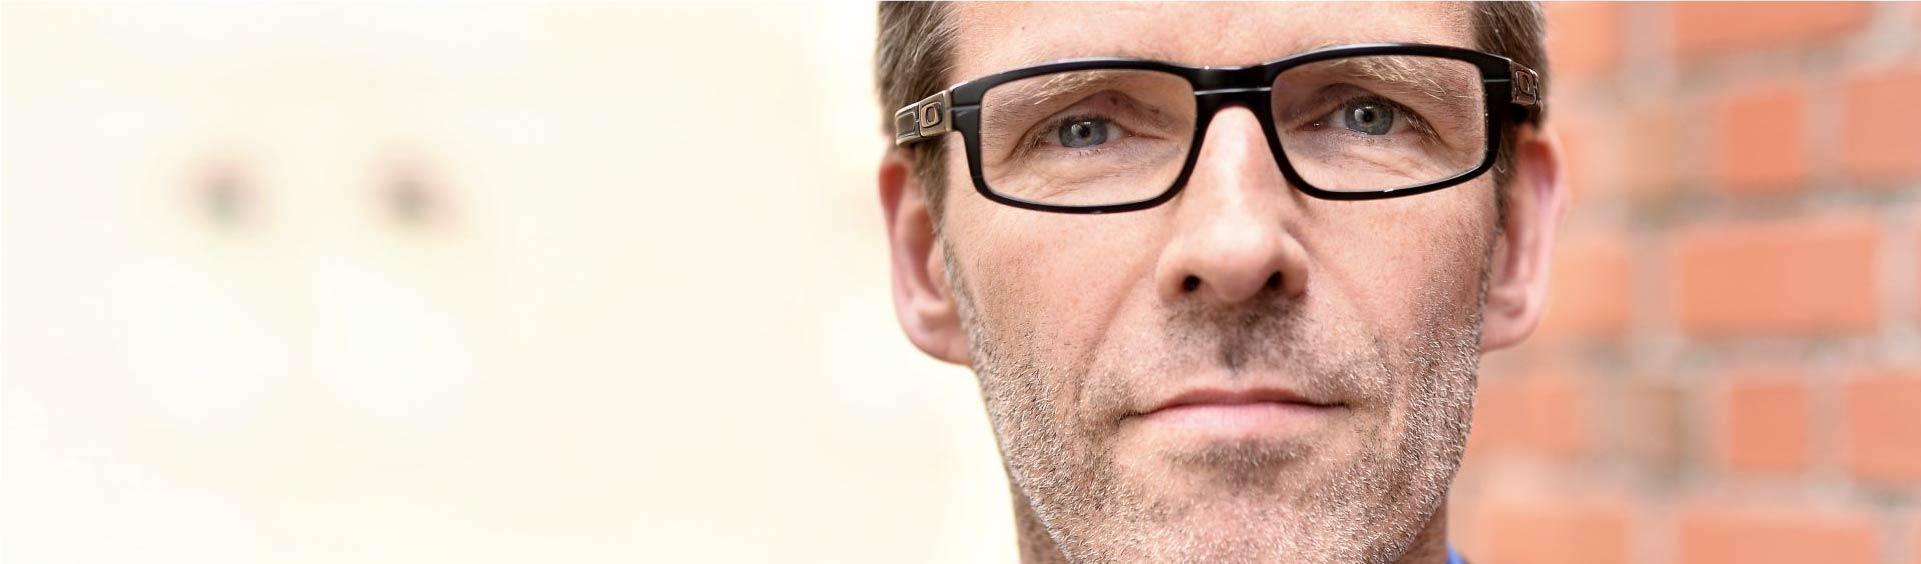 Jörg Schäffken - Partner bei ProModerare in Hamburg